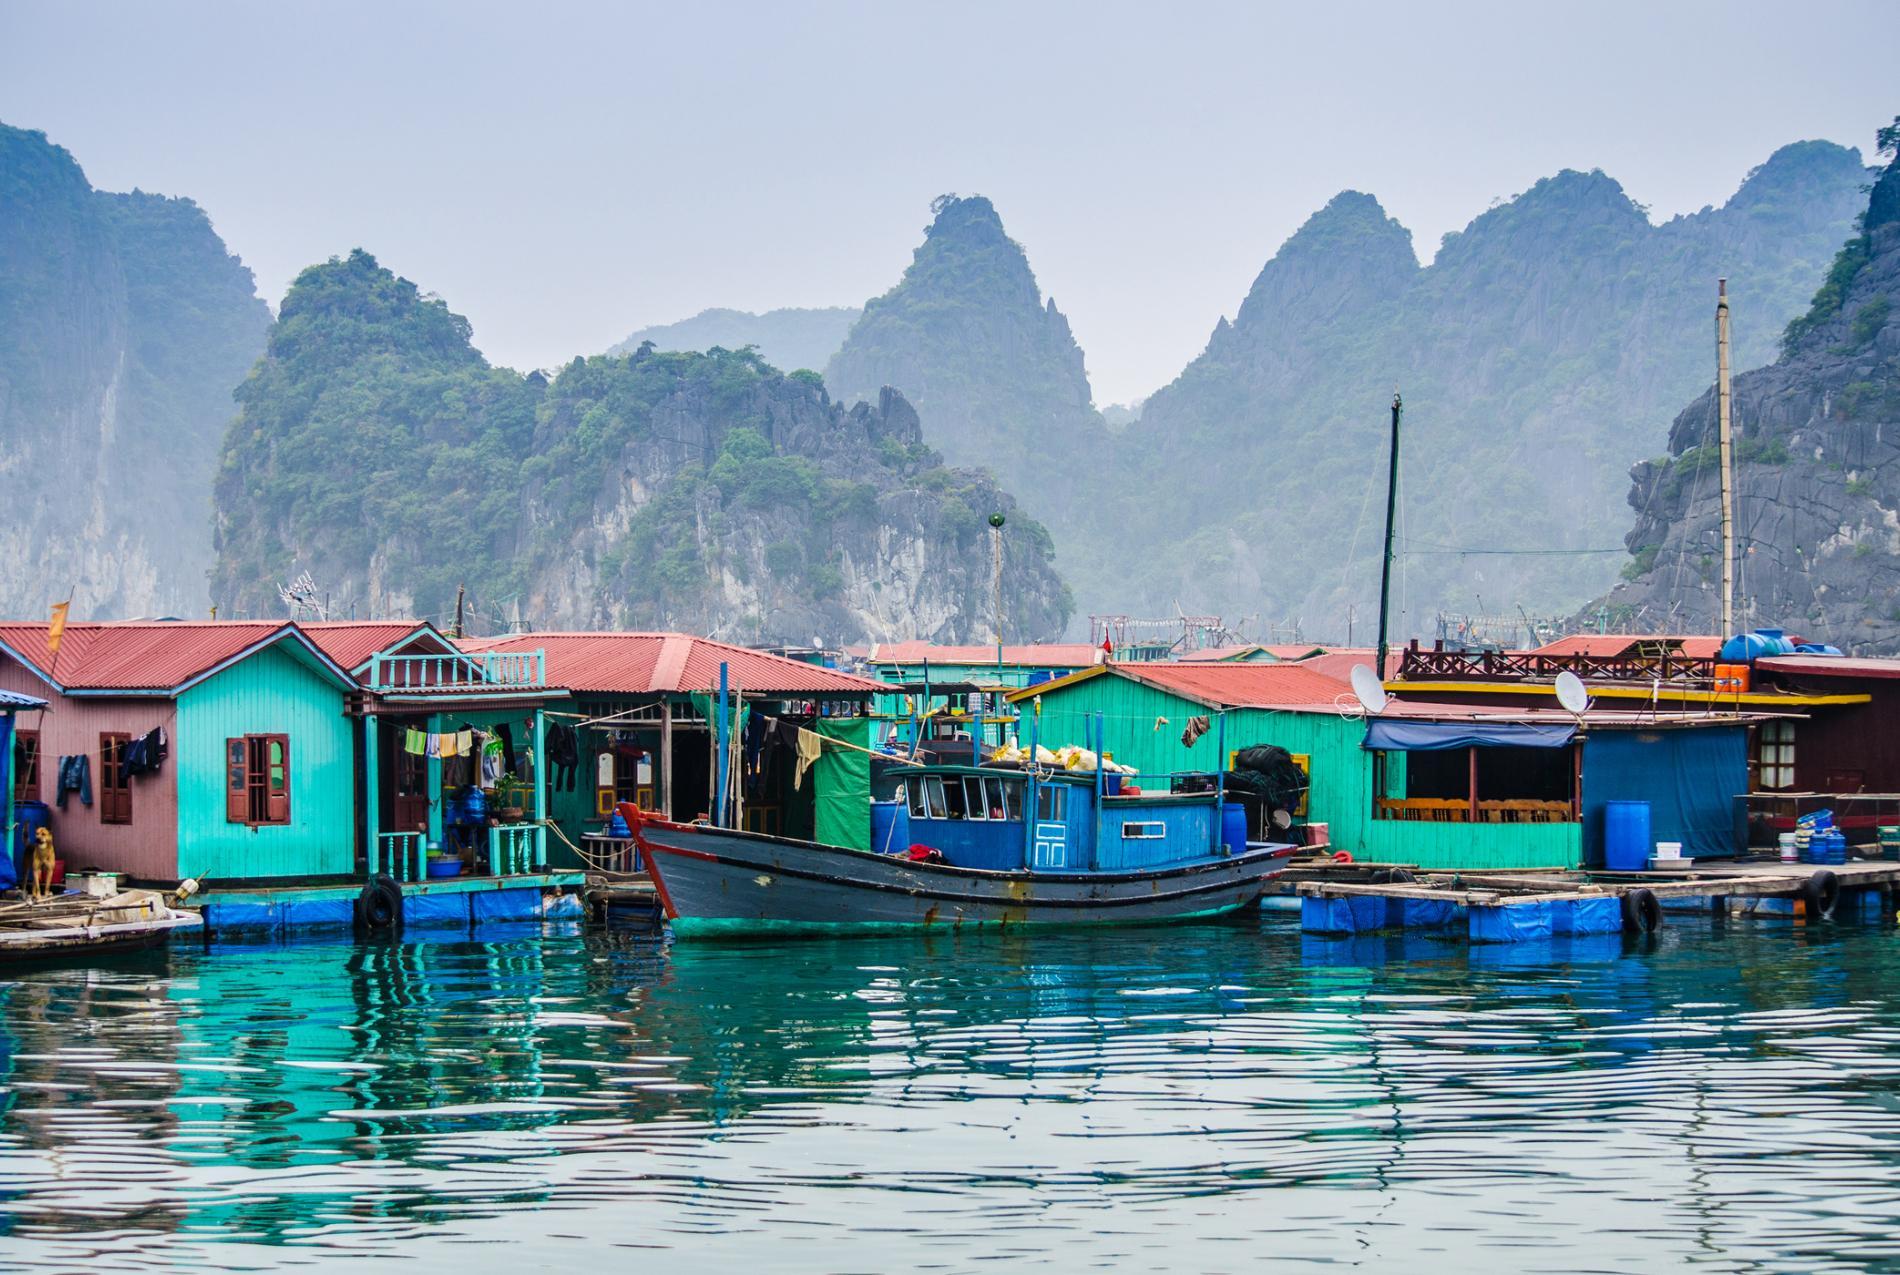 Voyage solidaire Vietnam-Cambodge : Vision du Monde - Photo 8